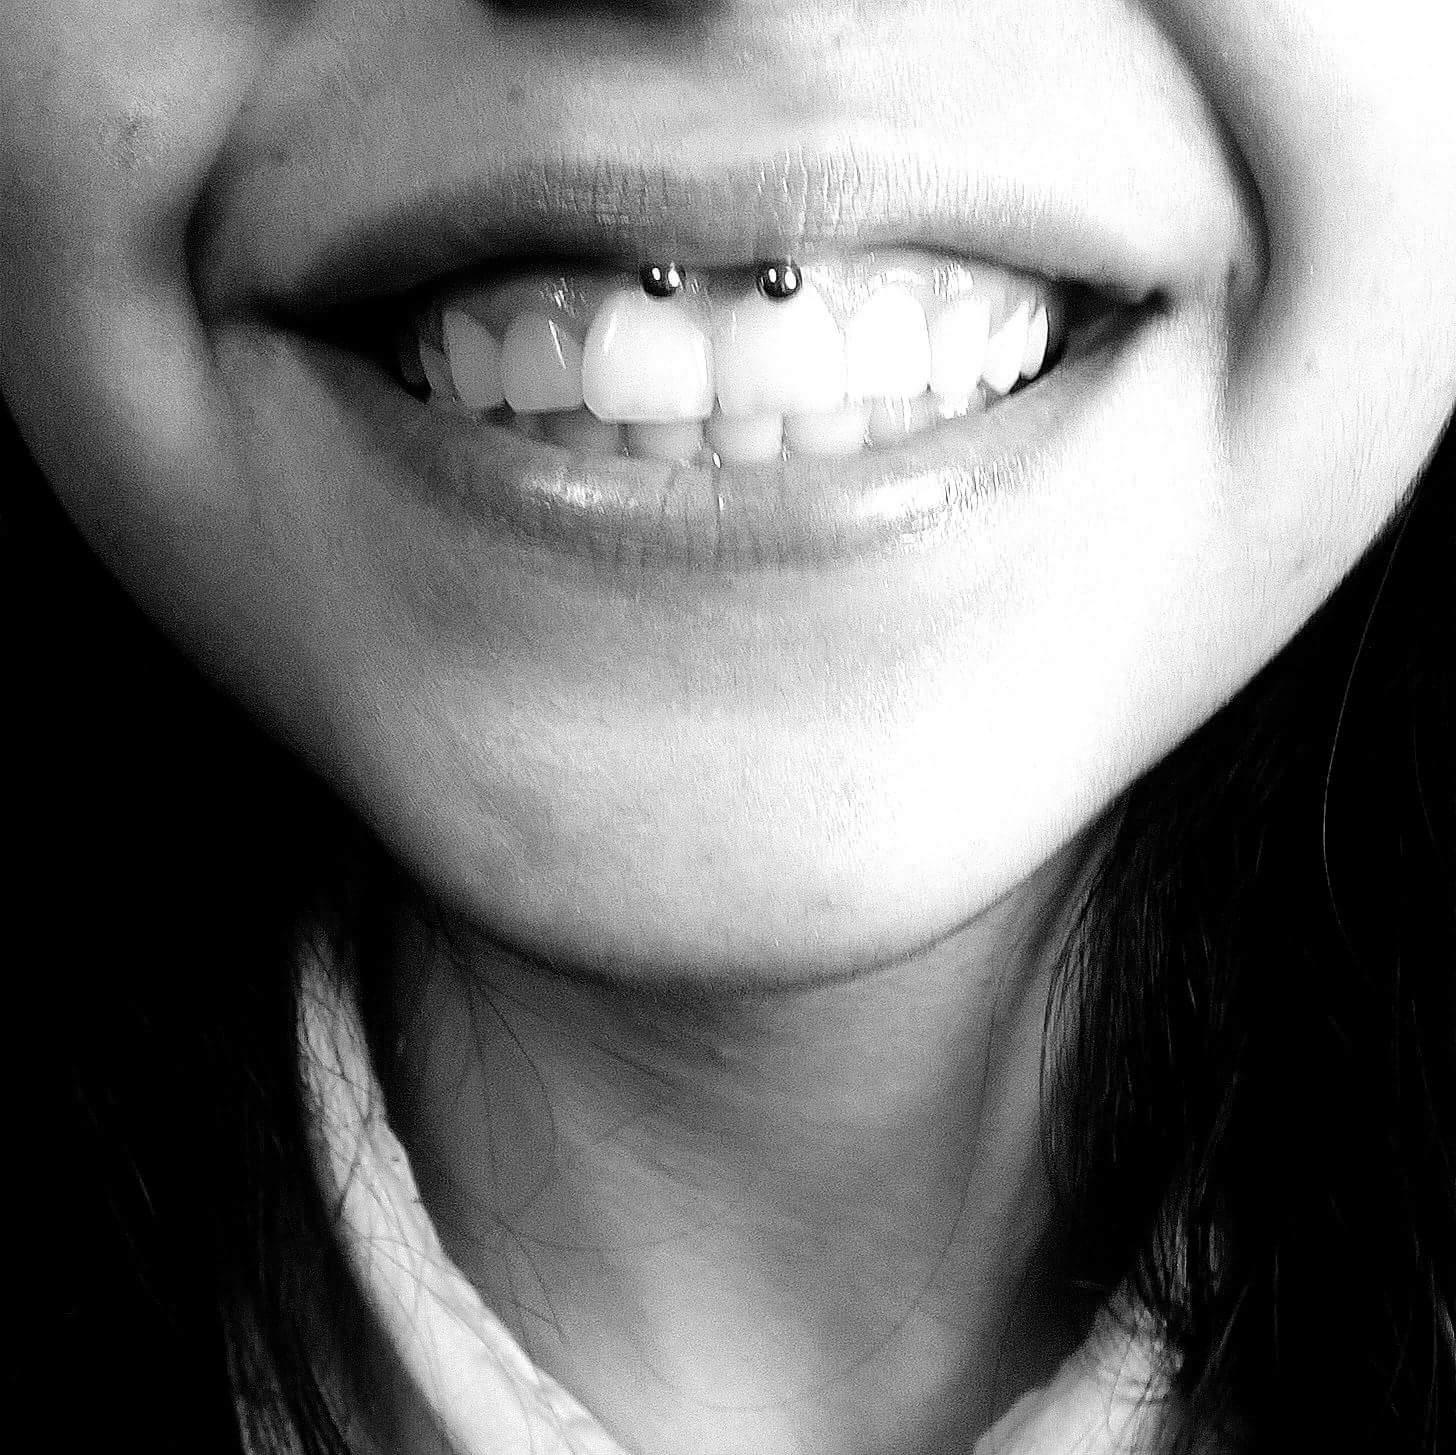 Smiley Piercing Morden